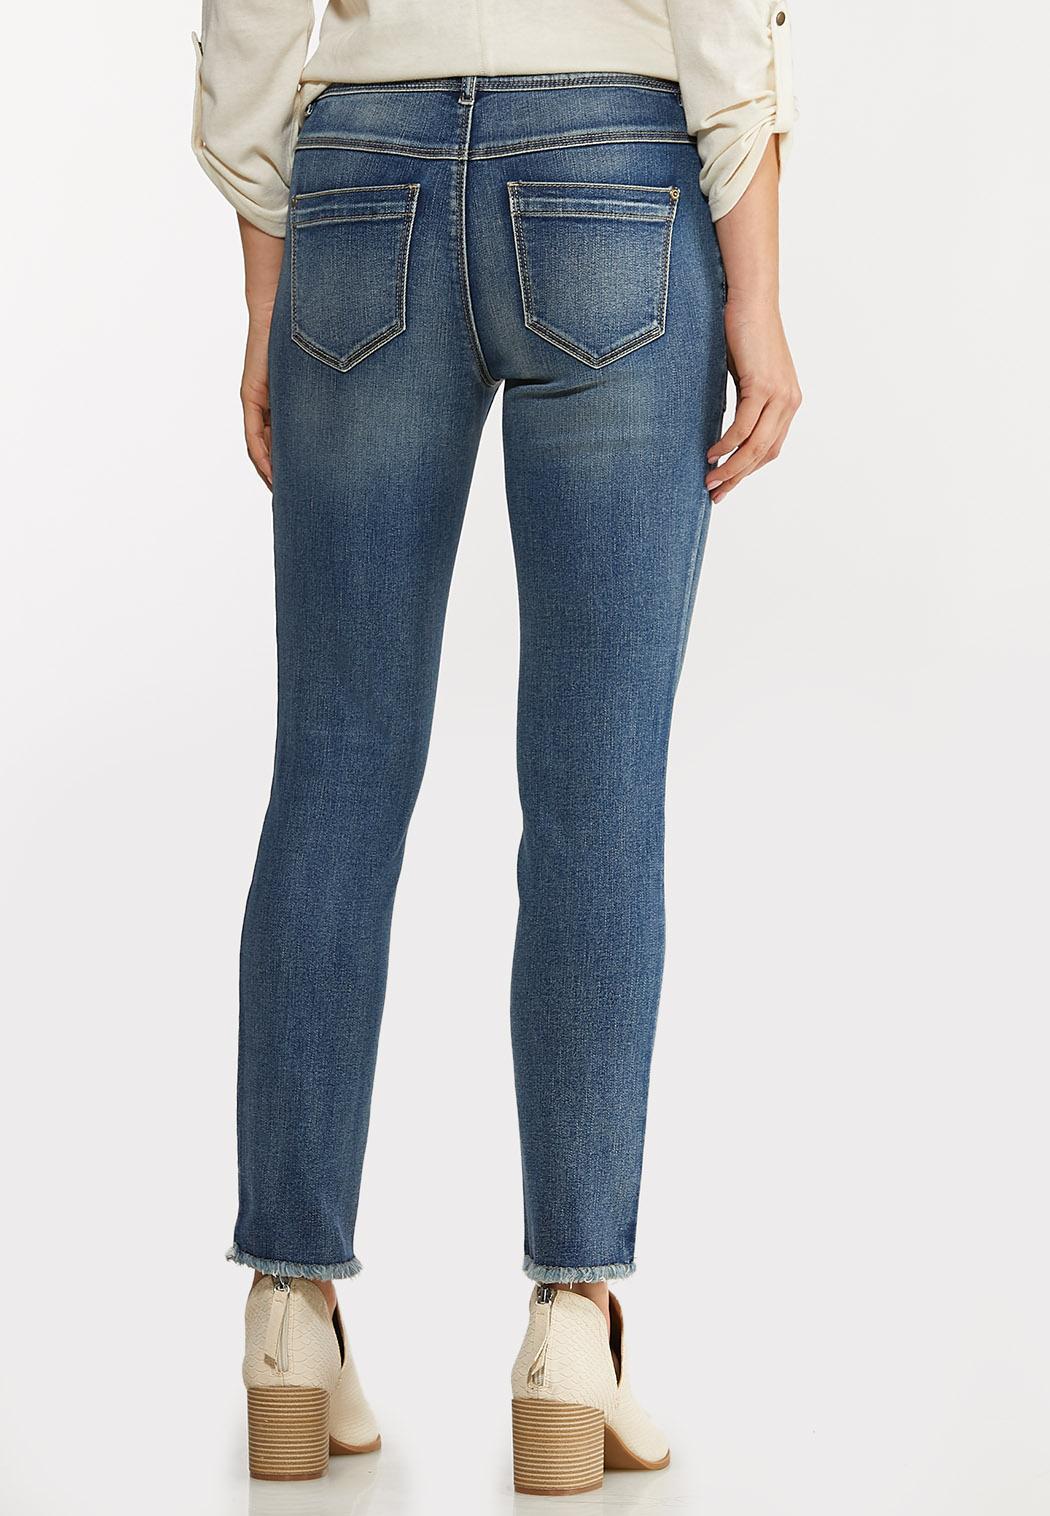 Fray Hem Utility Jeans (Item #44068248)